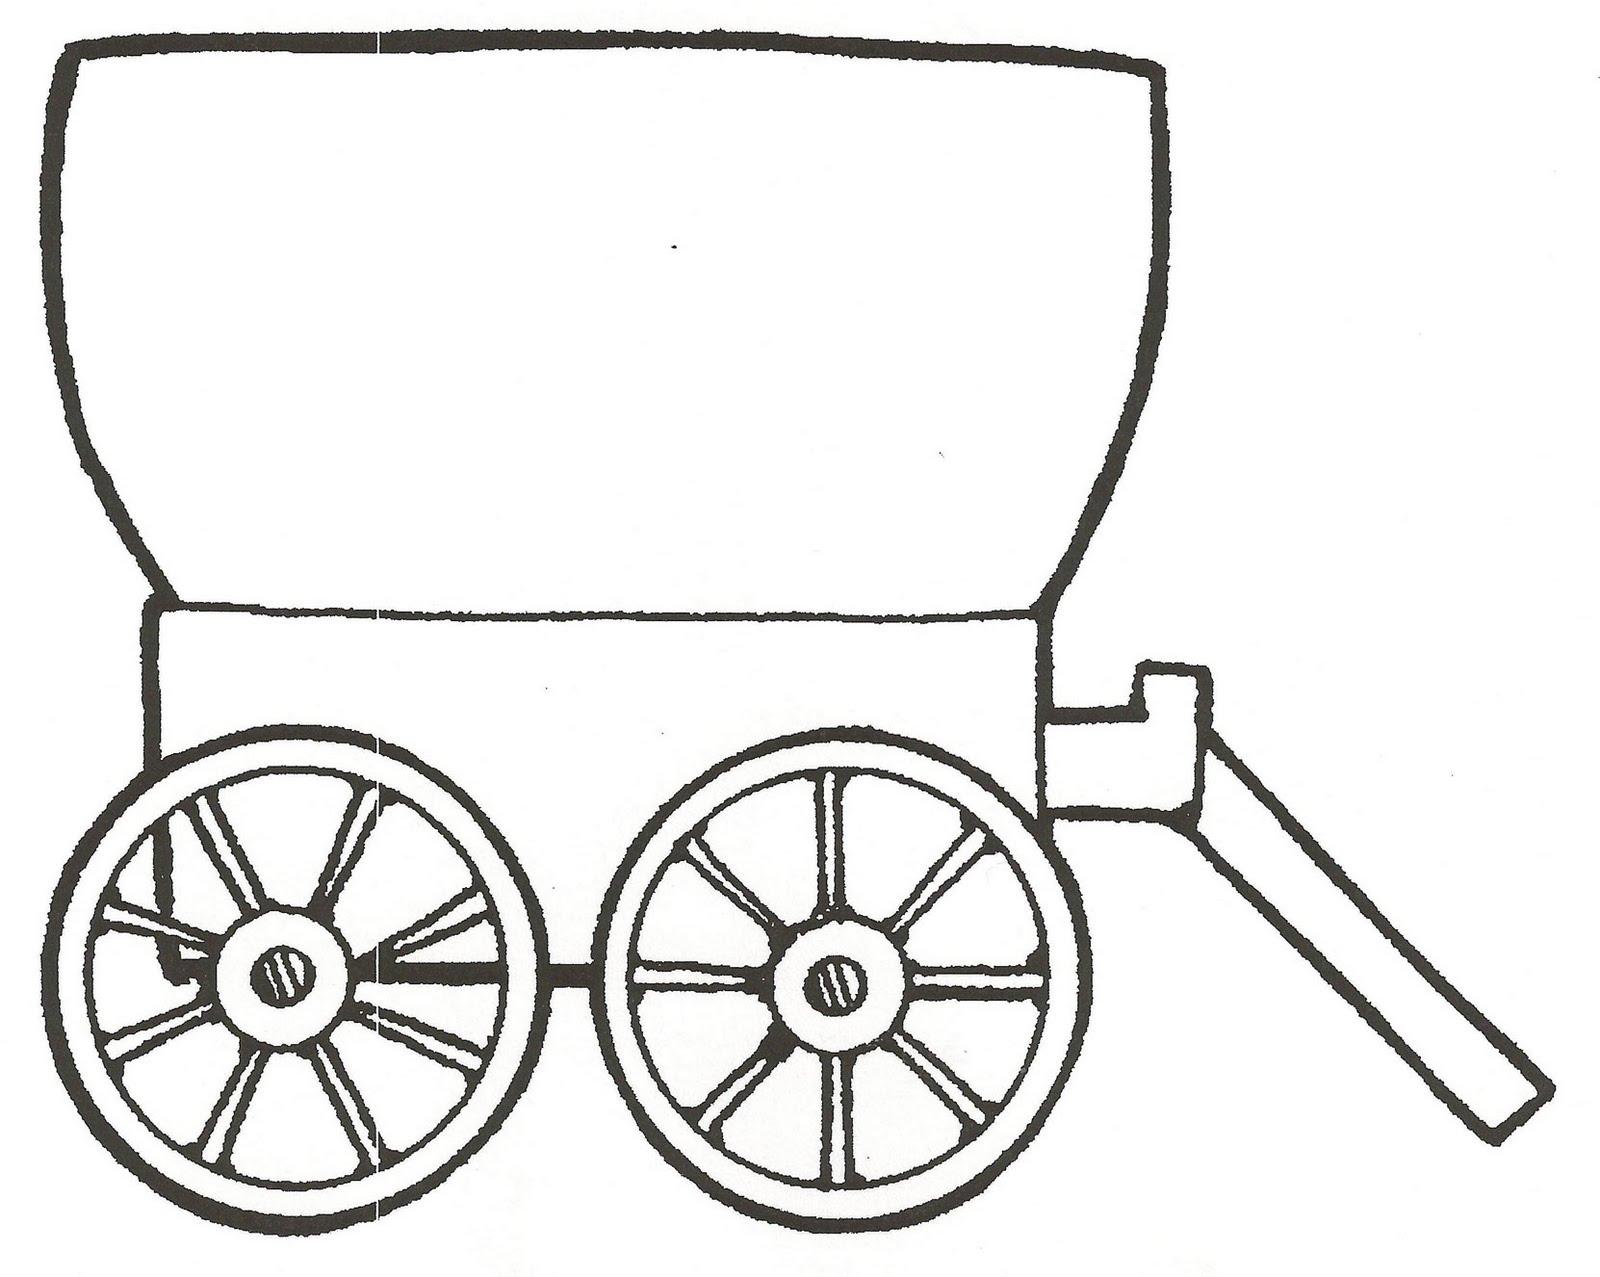 Wild West clipart pioneer wagon #4